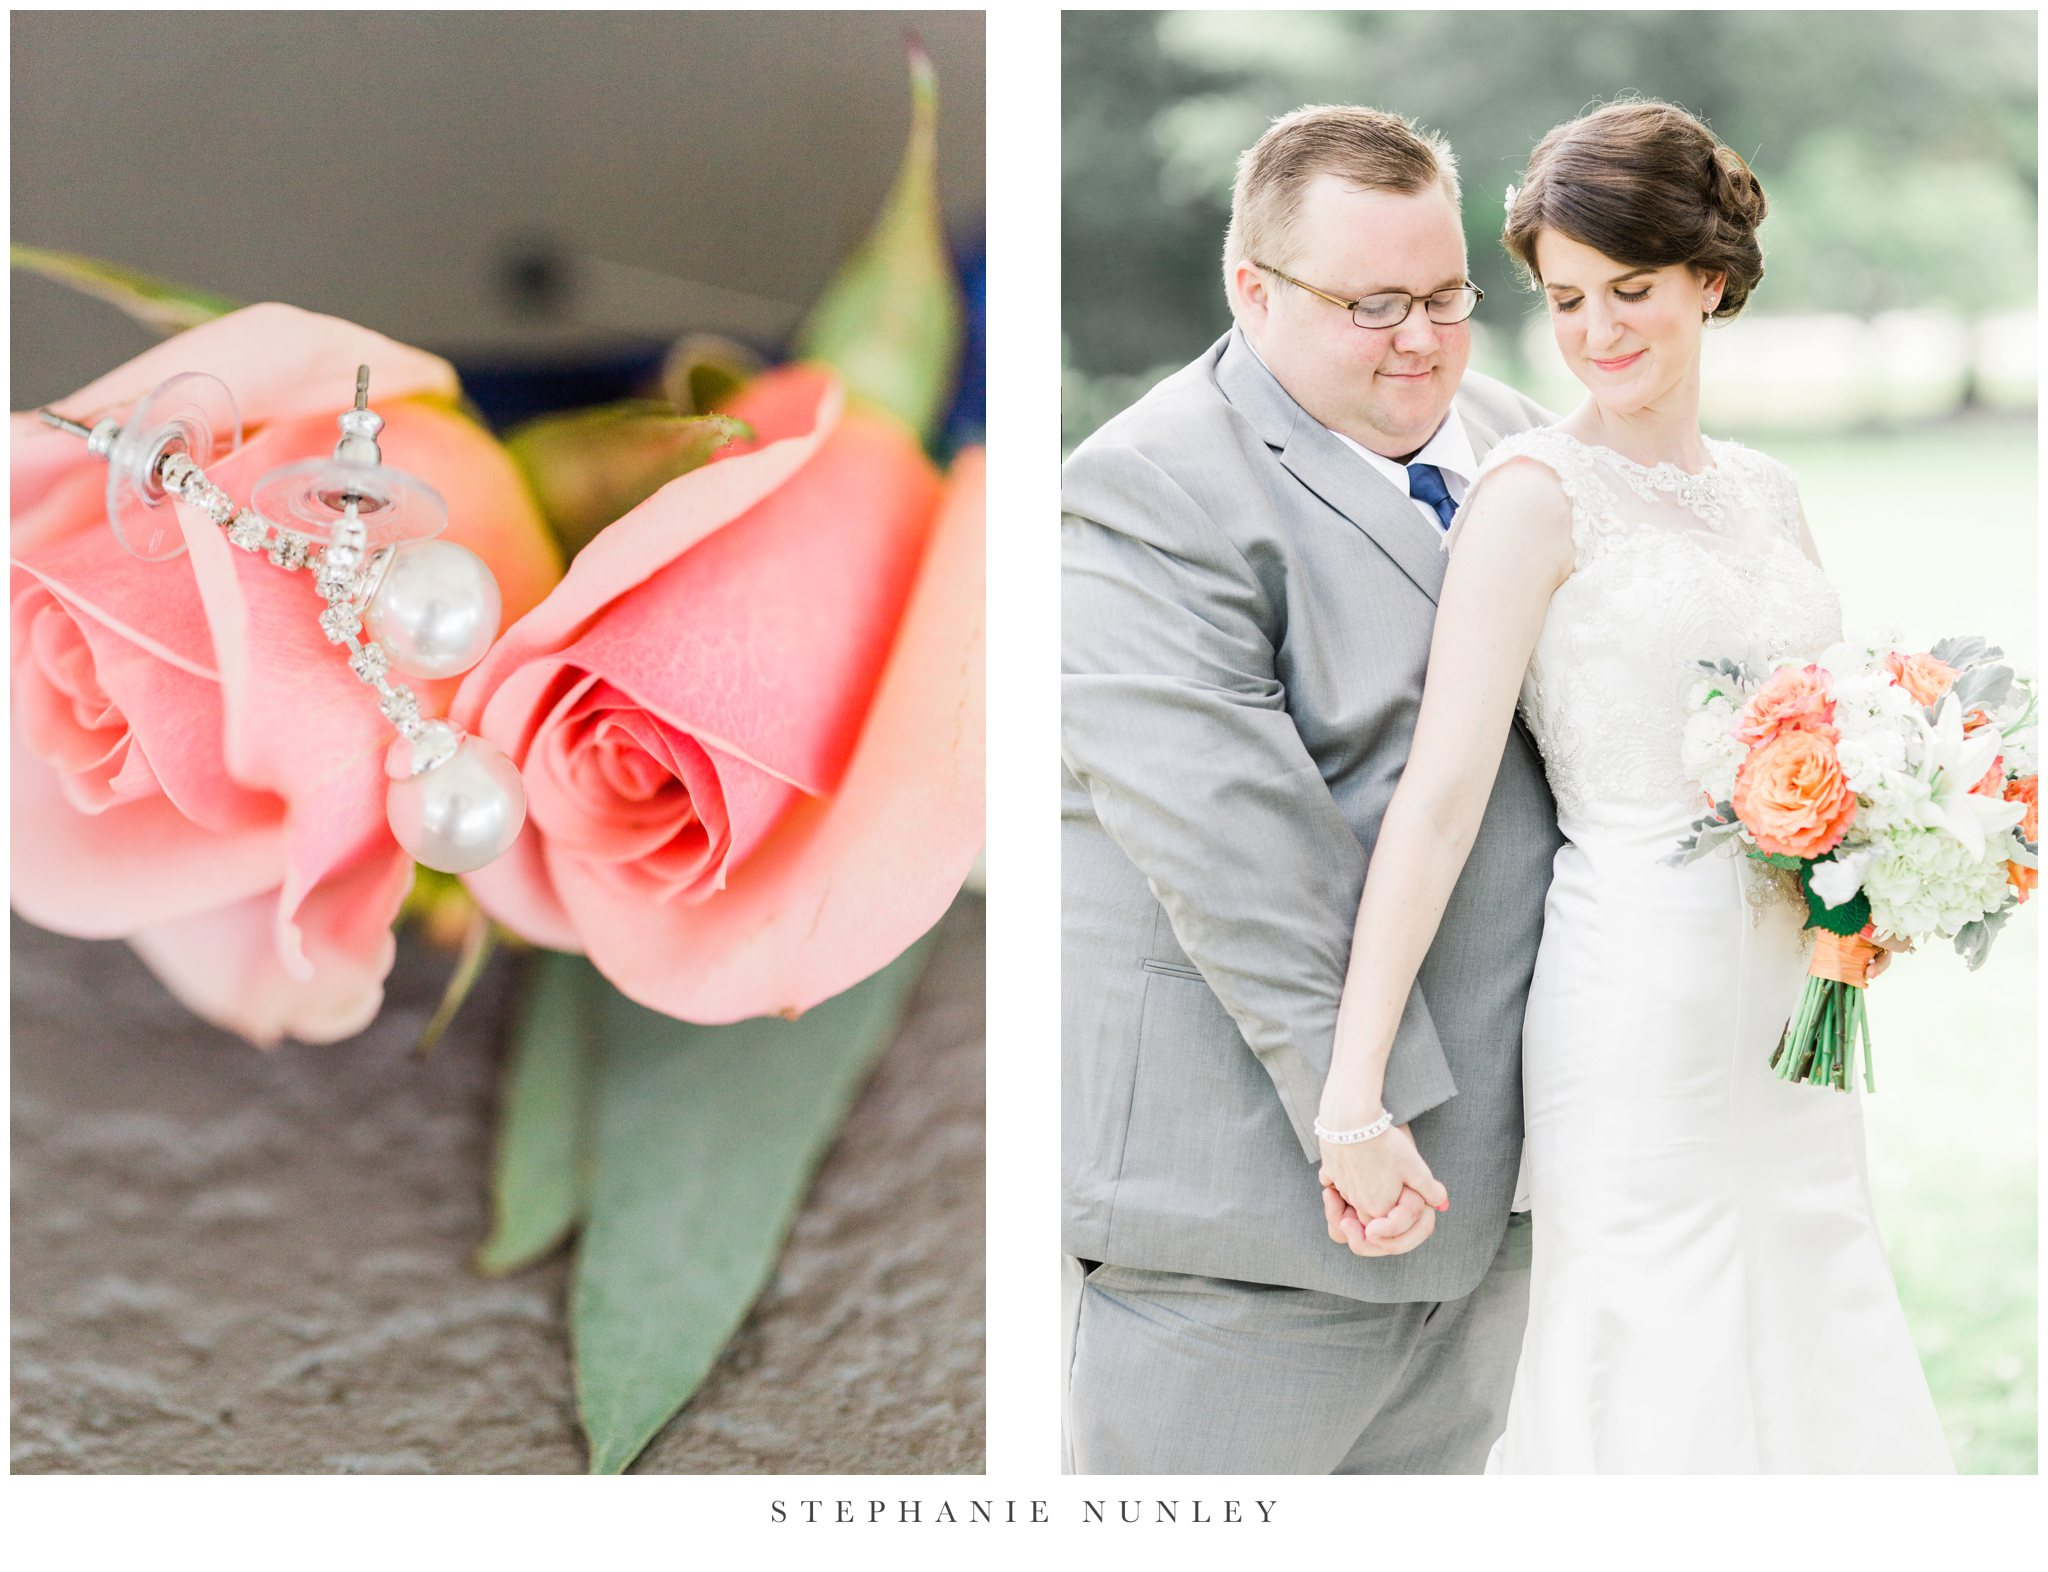 next-level-events-wedding-photos-in-little-rock-0012.jpg